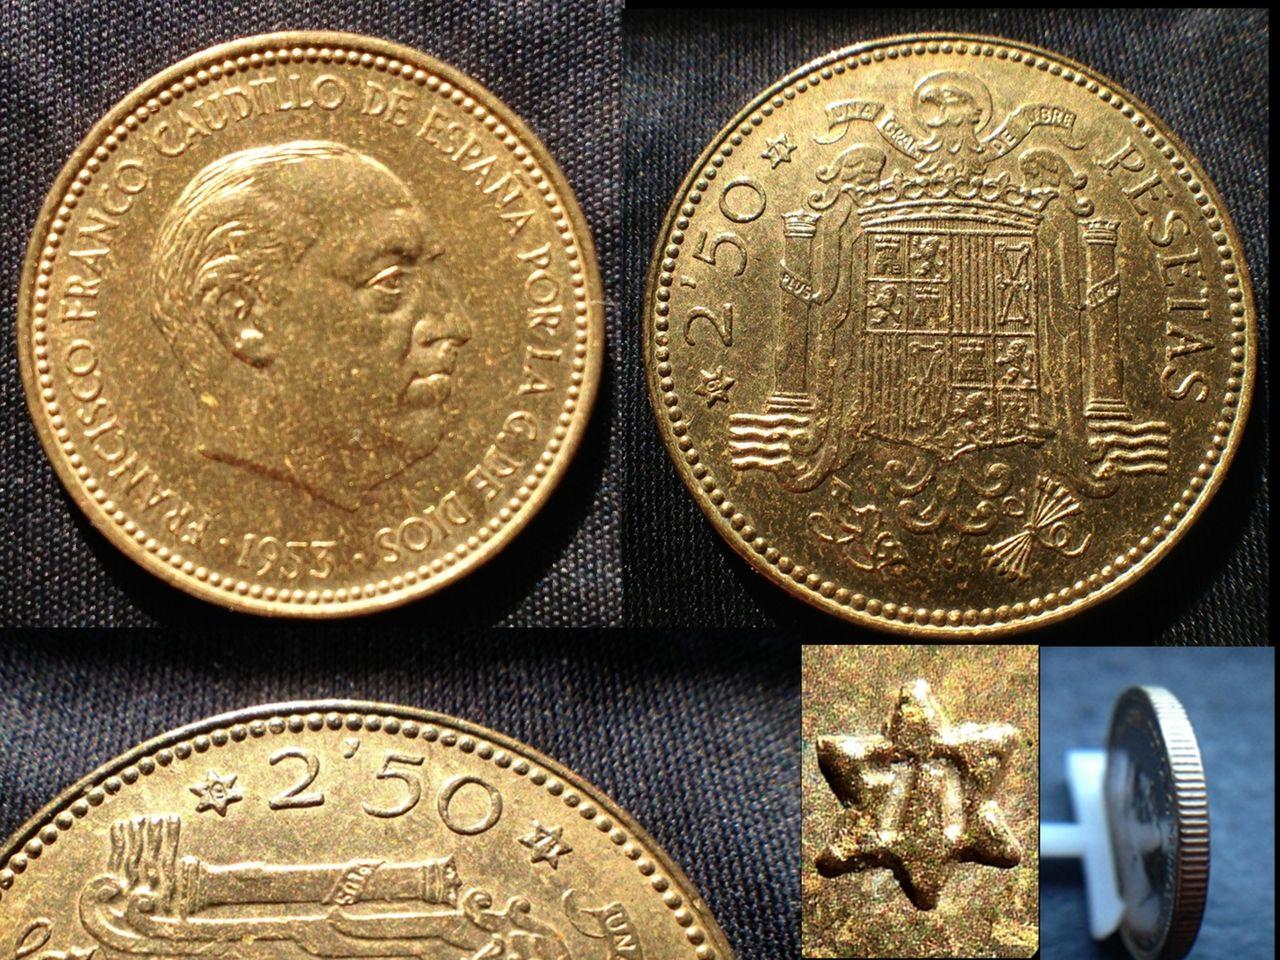 2,50 pesetas 1953-*71- Estado Español Image